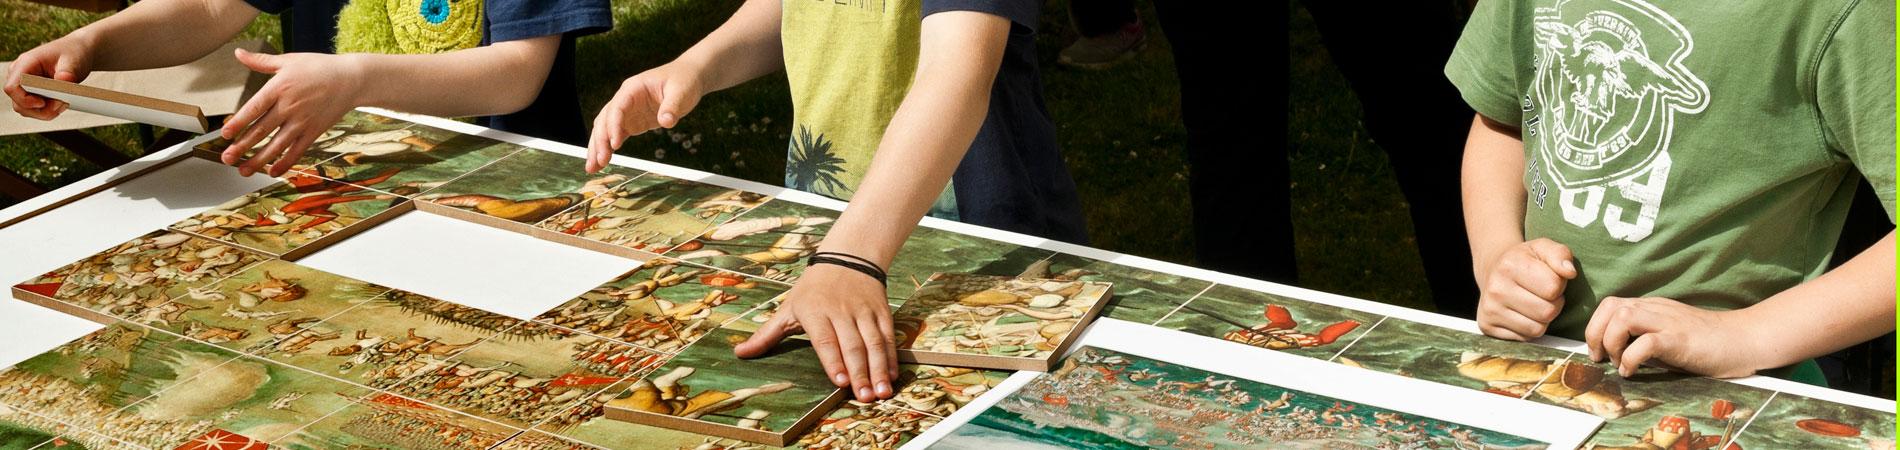 Kunst-Puzzle am Museumstag auf der Veste Coburg